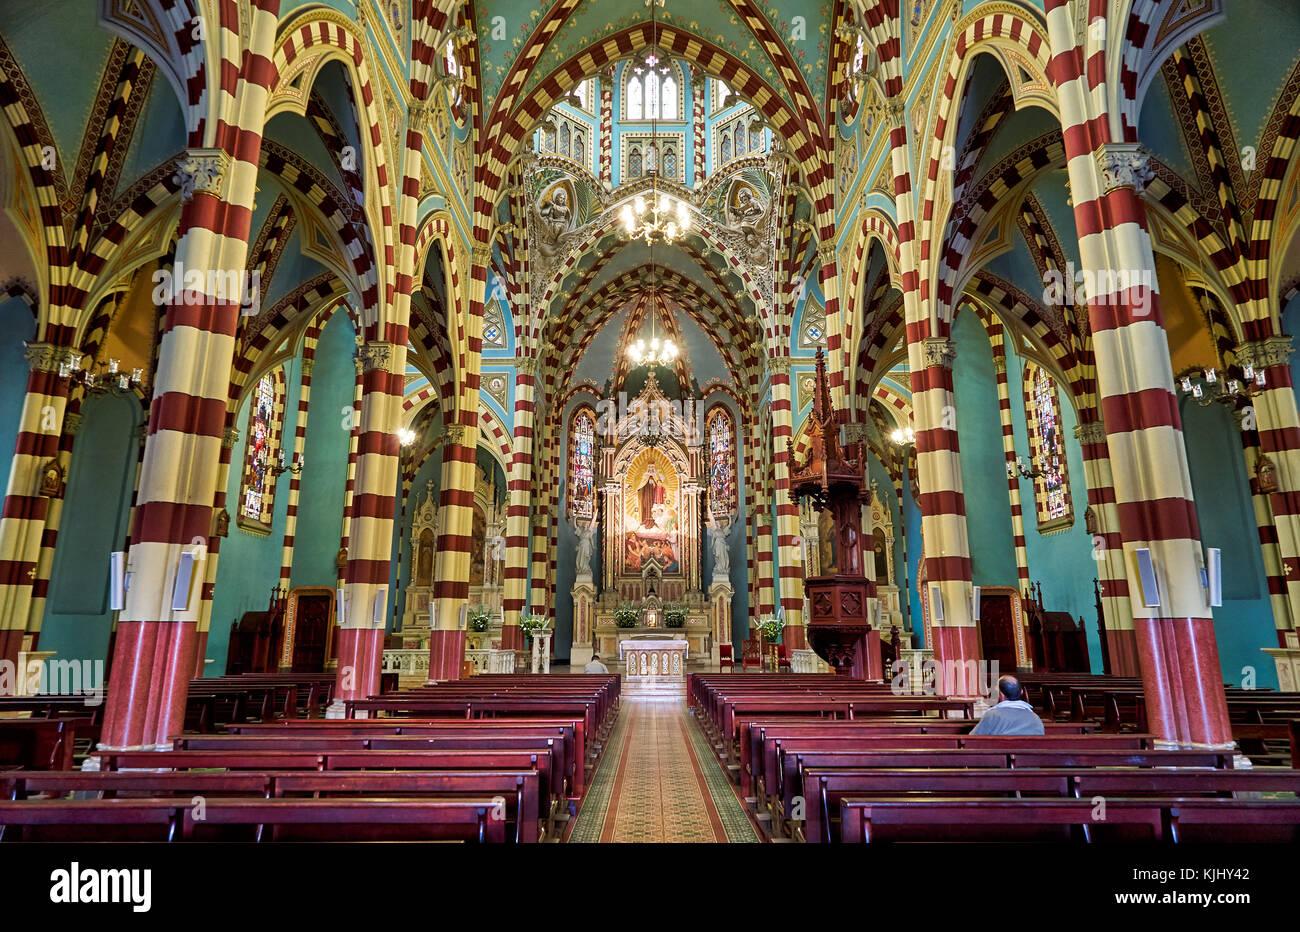 interior shot of church Santuario Nuestra Senora del Carmen, Bogota, Colombia, South America - Stock Image